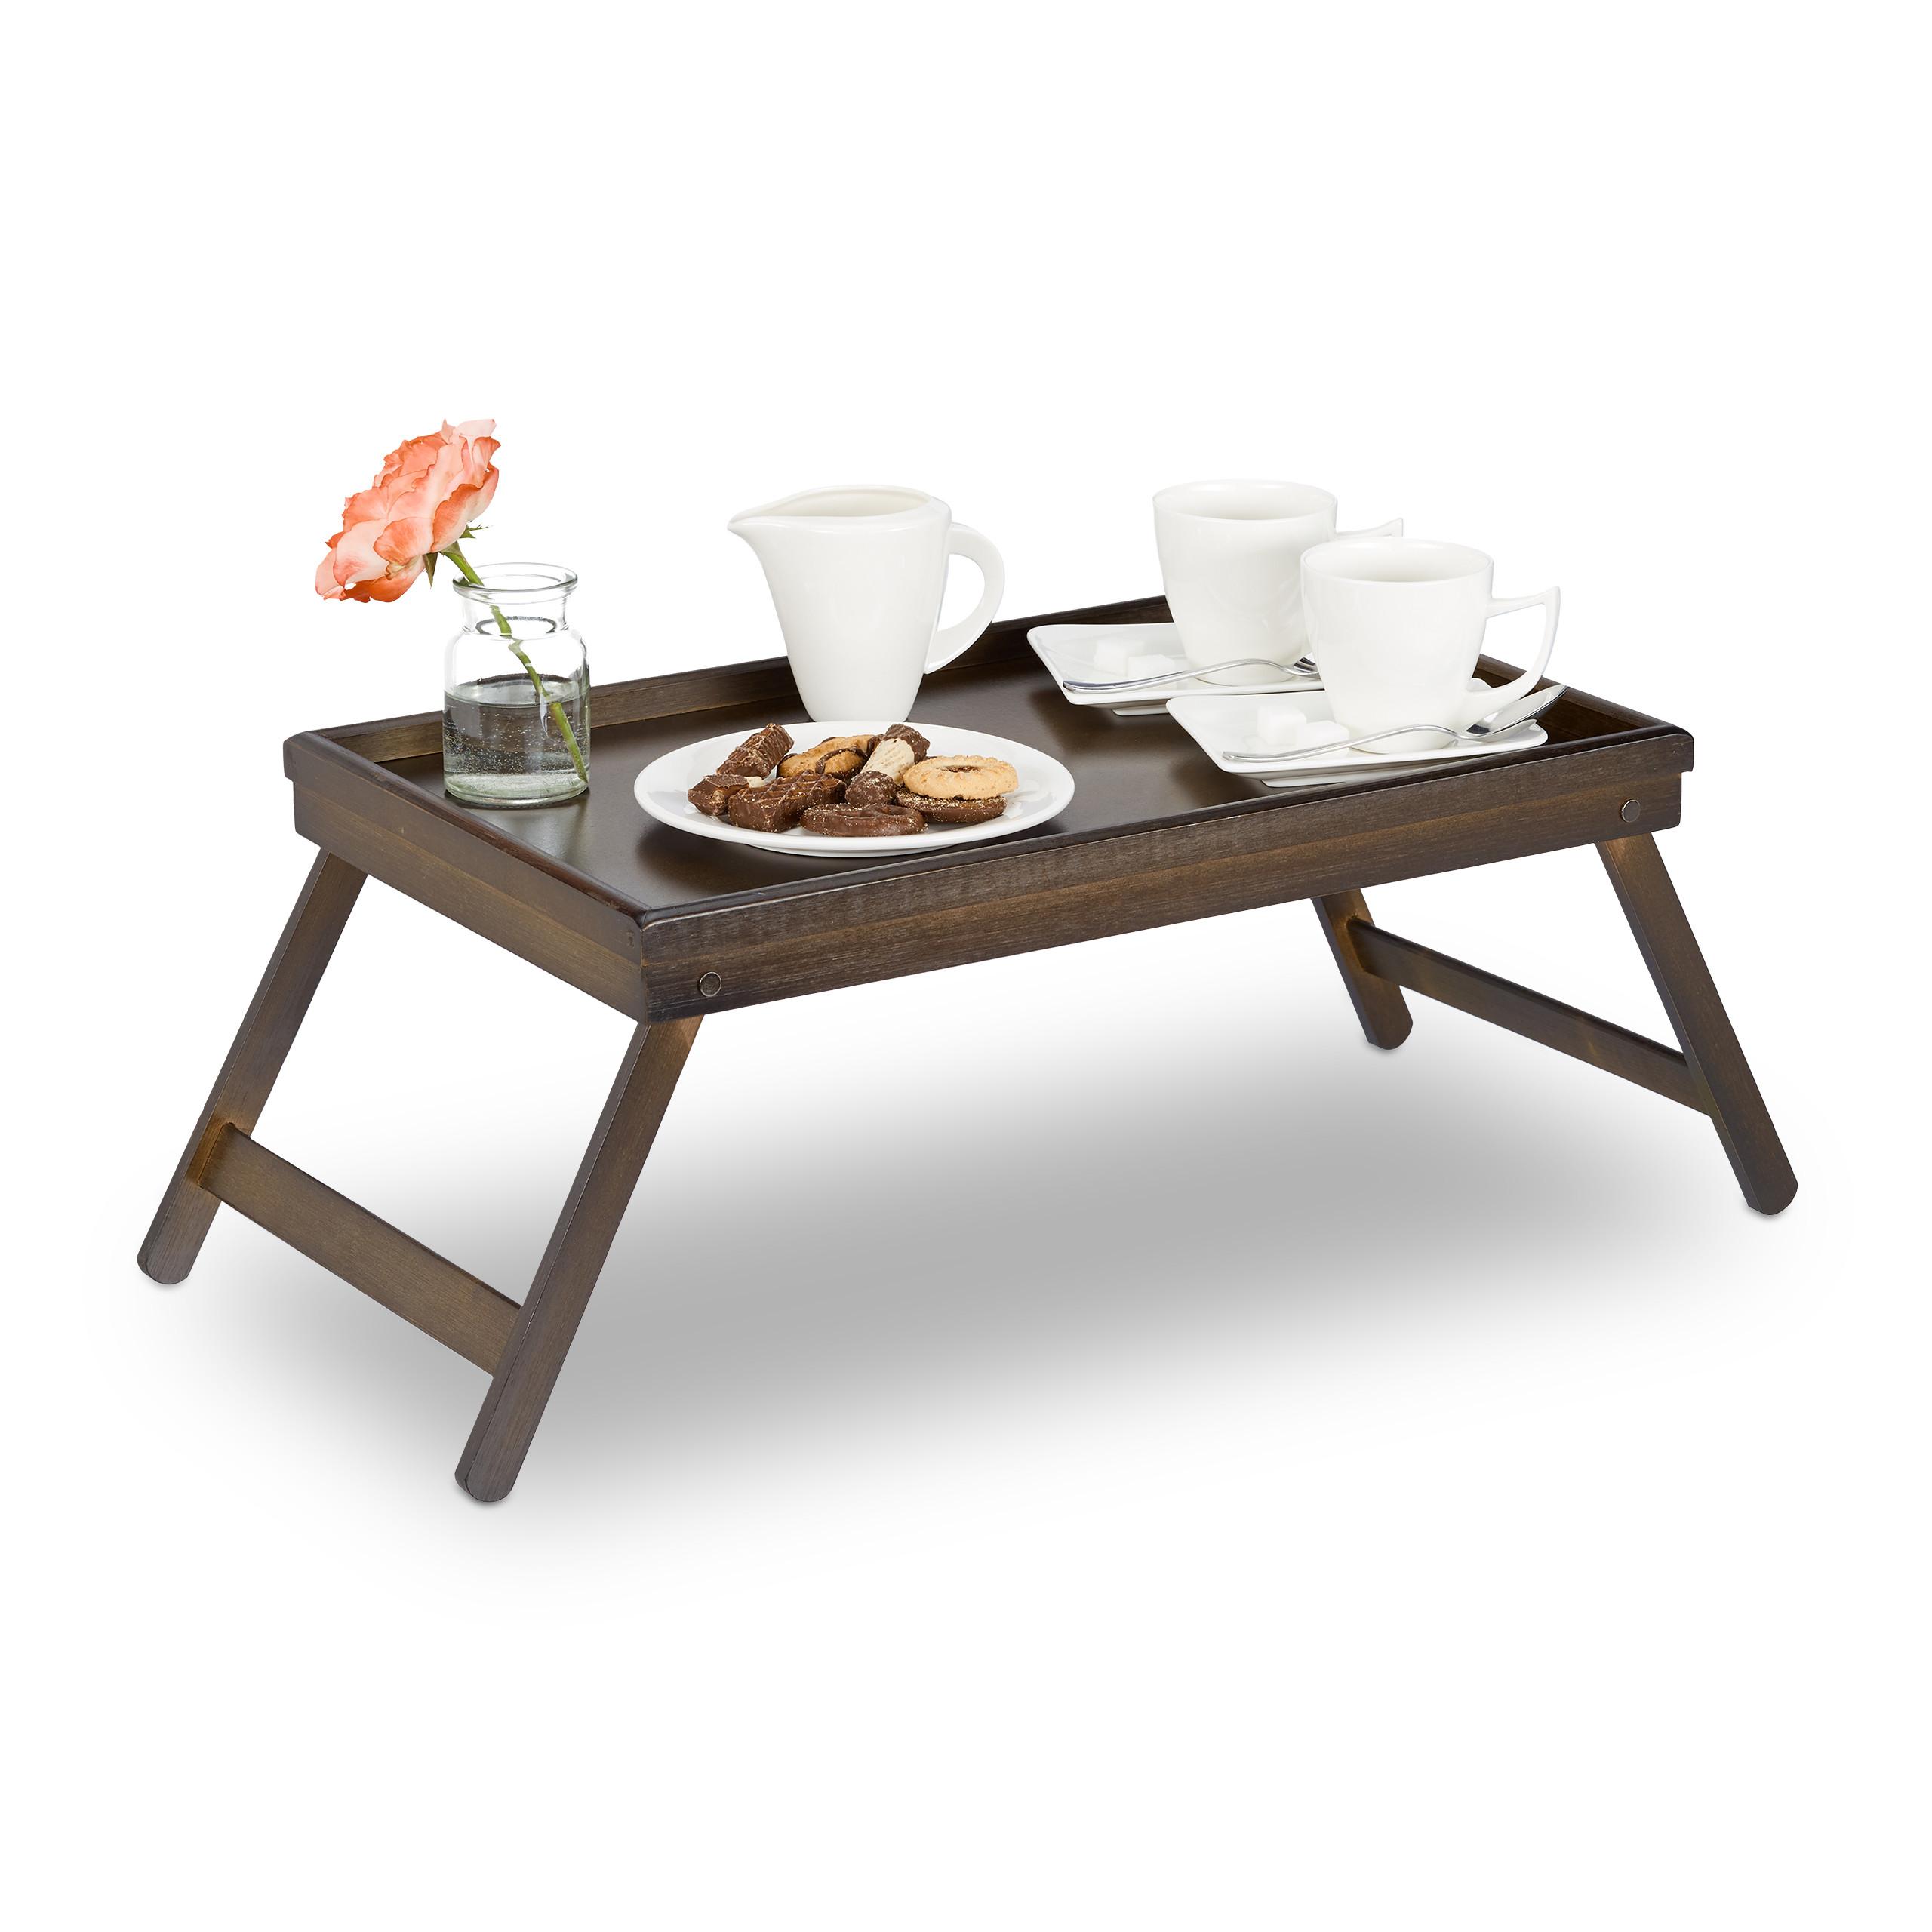 Betttablett Bambus Betttisch klappbar Frühstückstablett Tabletttisch Holztablett